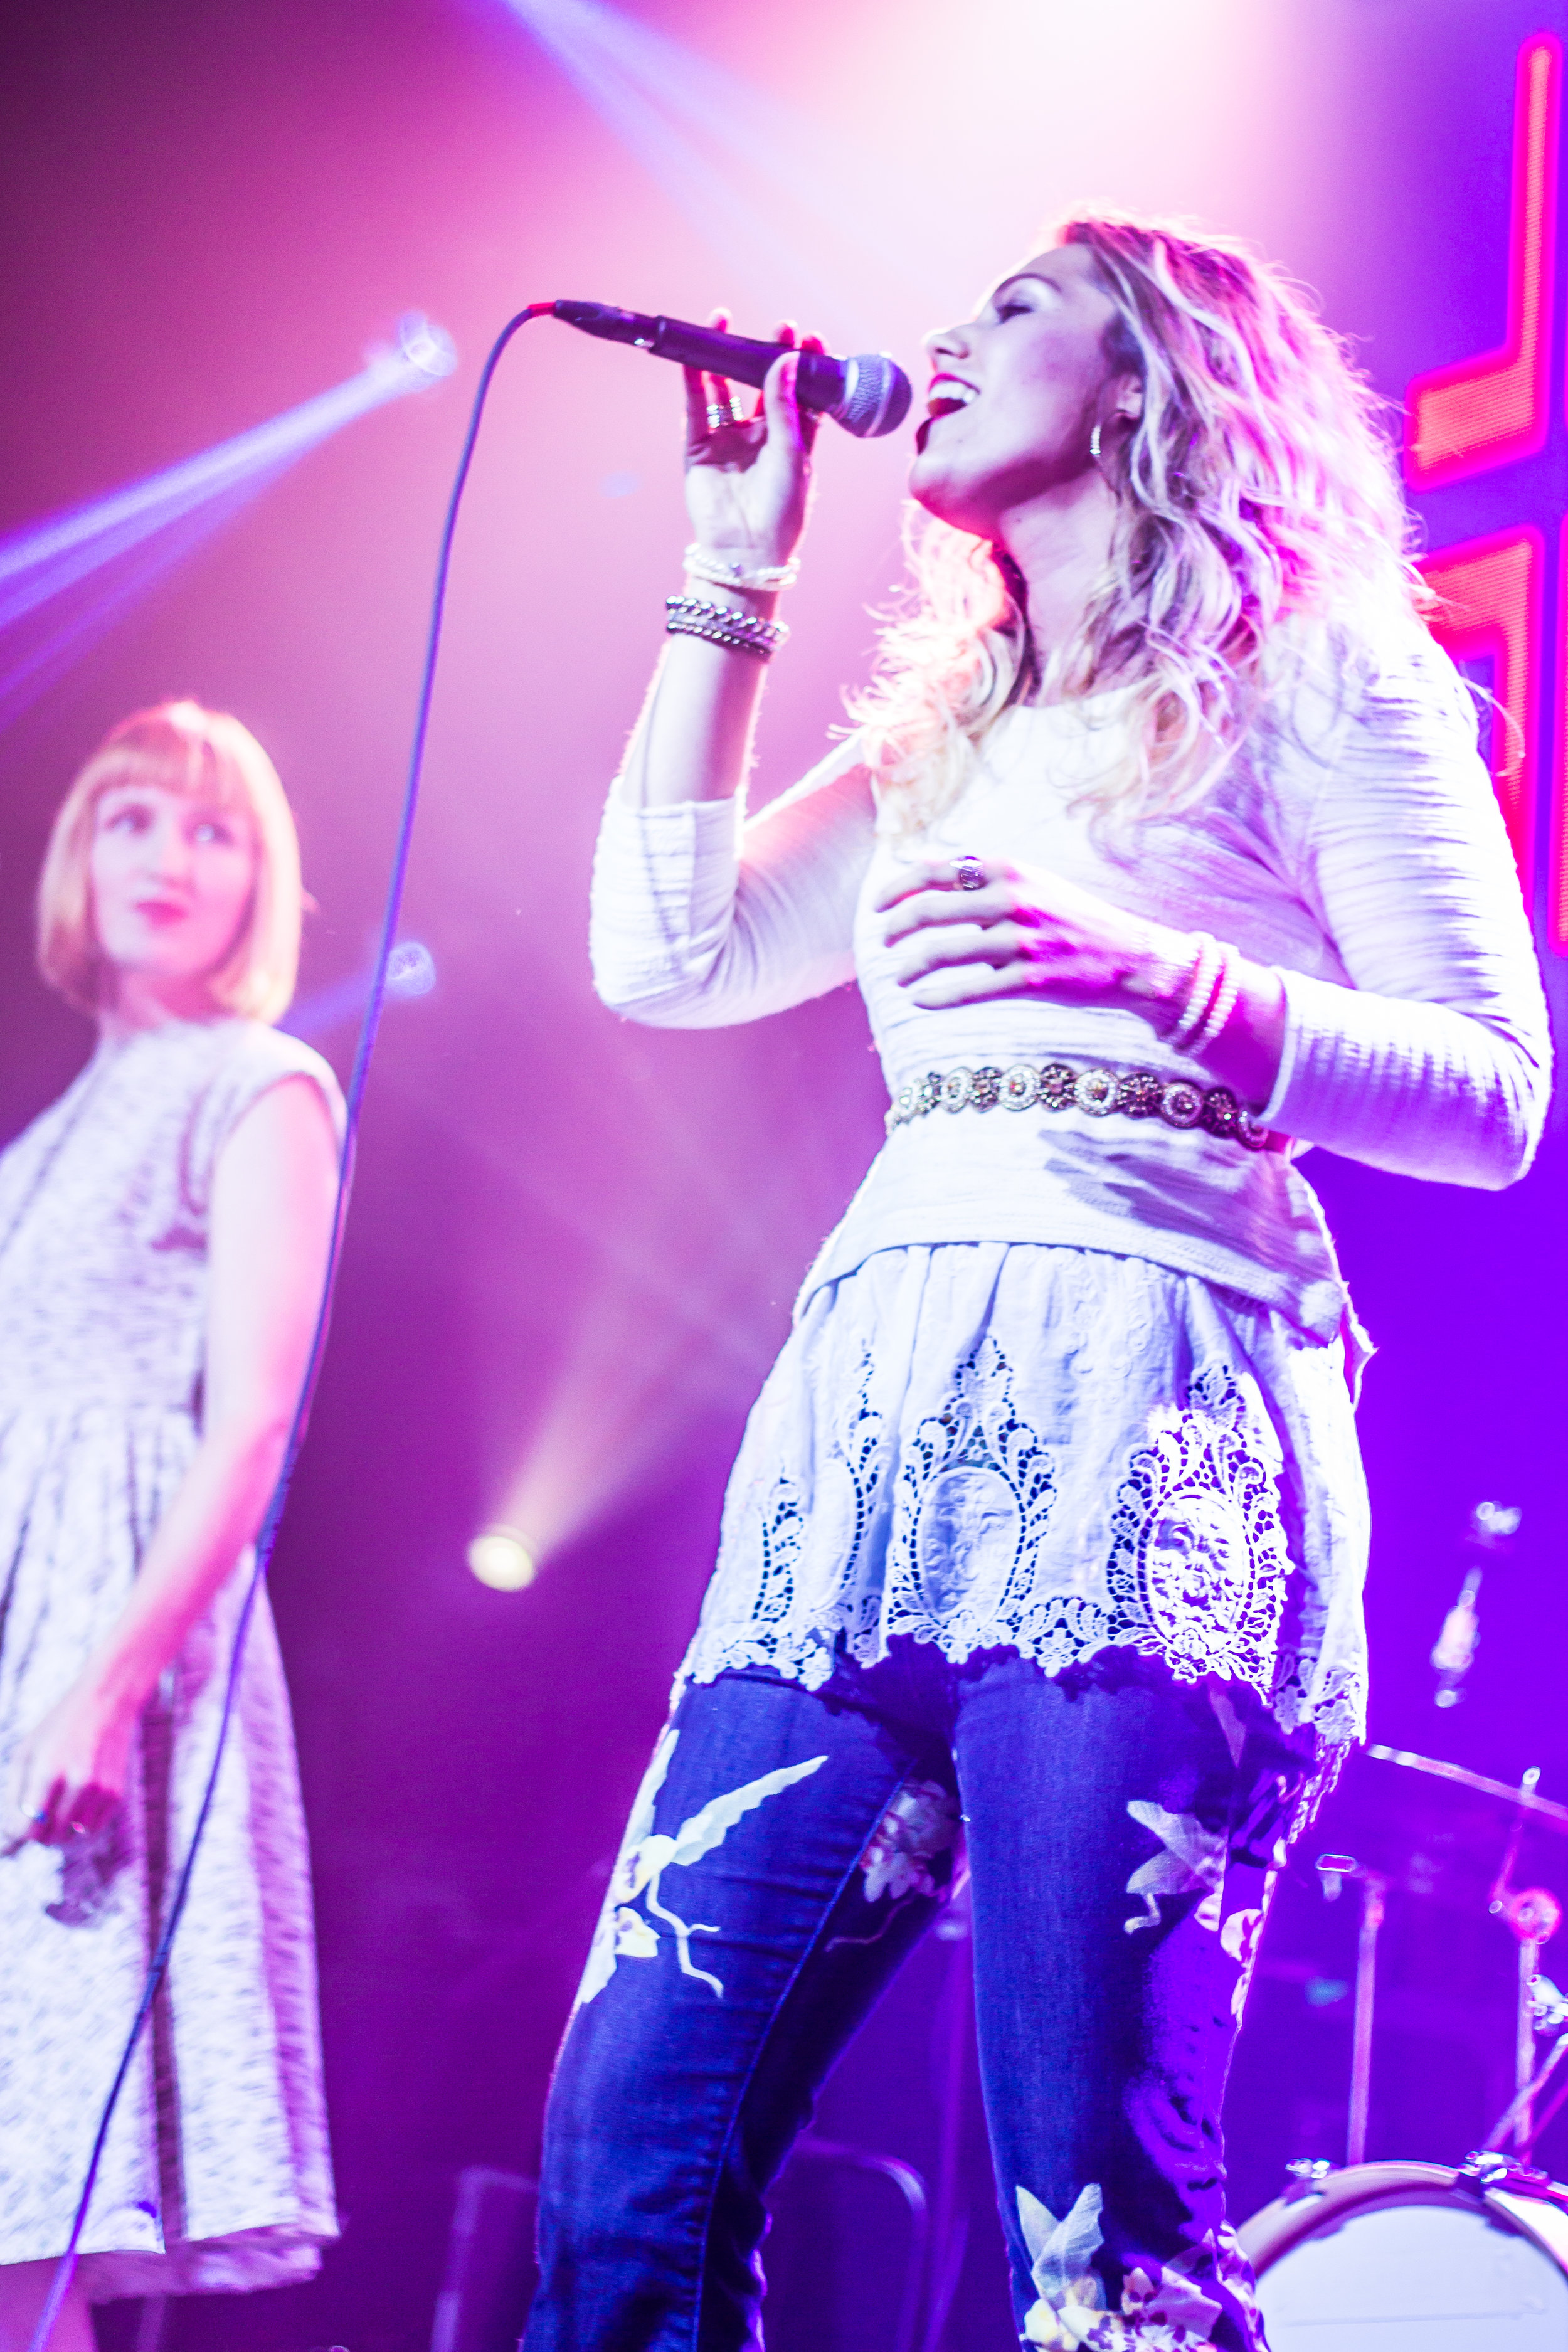 live concert pic.jpg